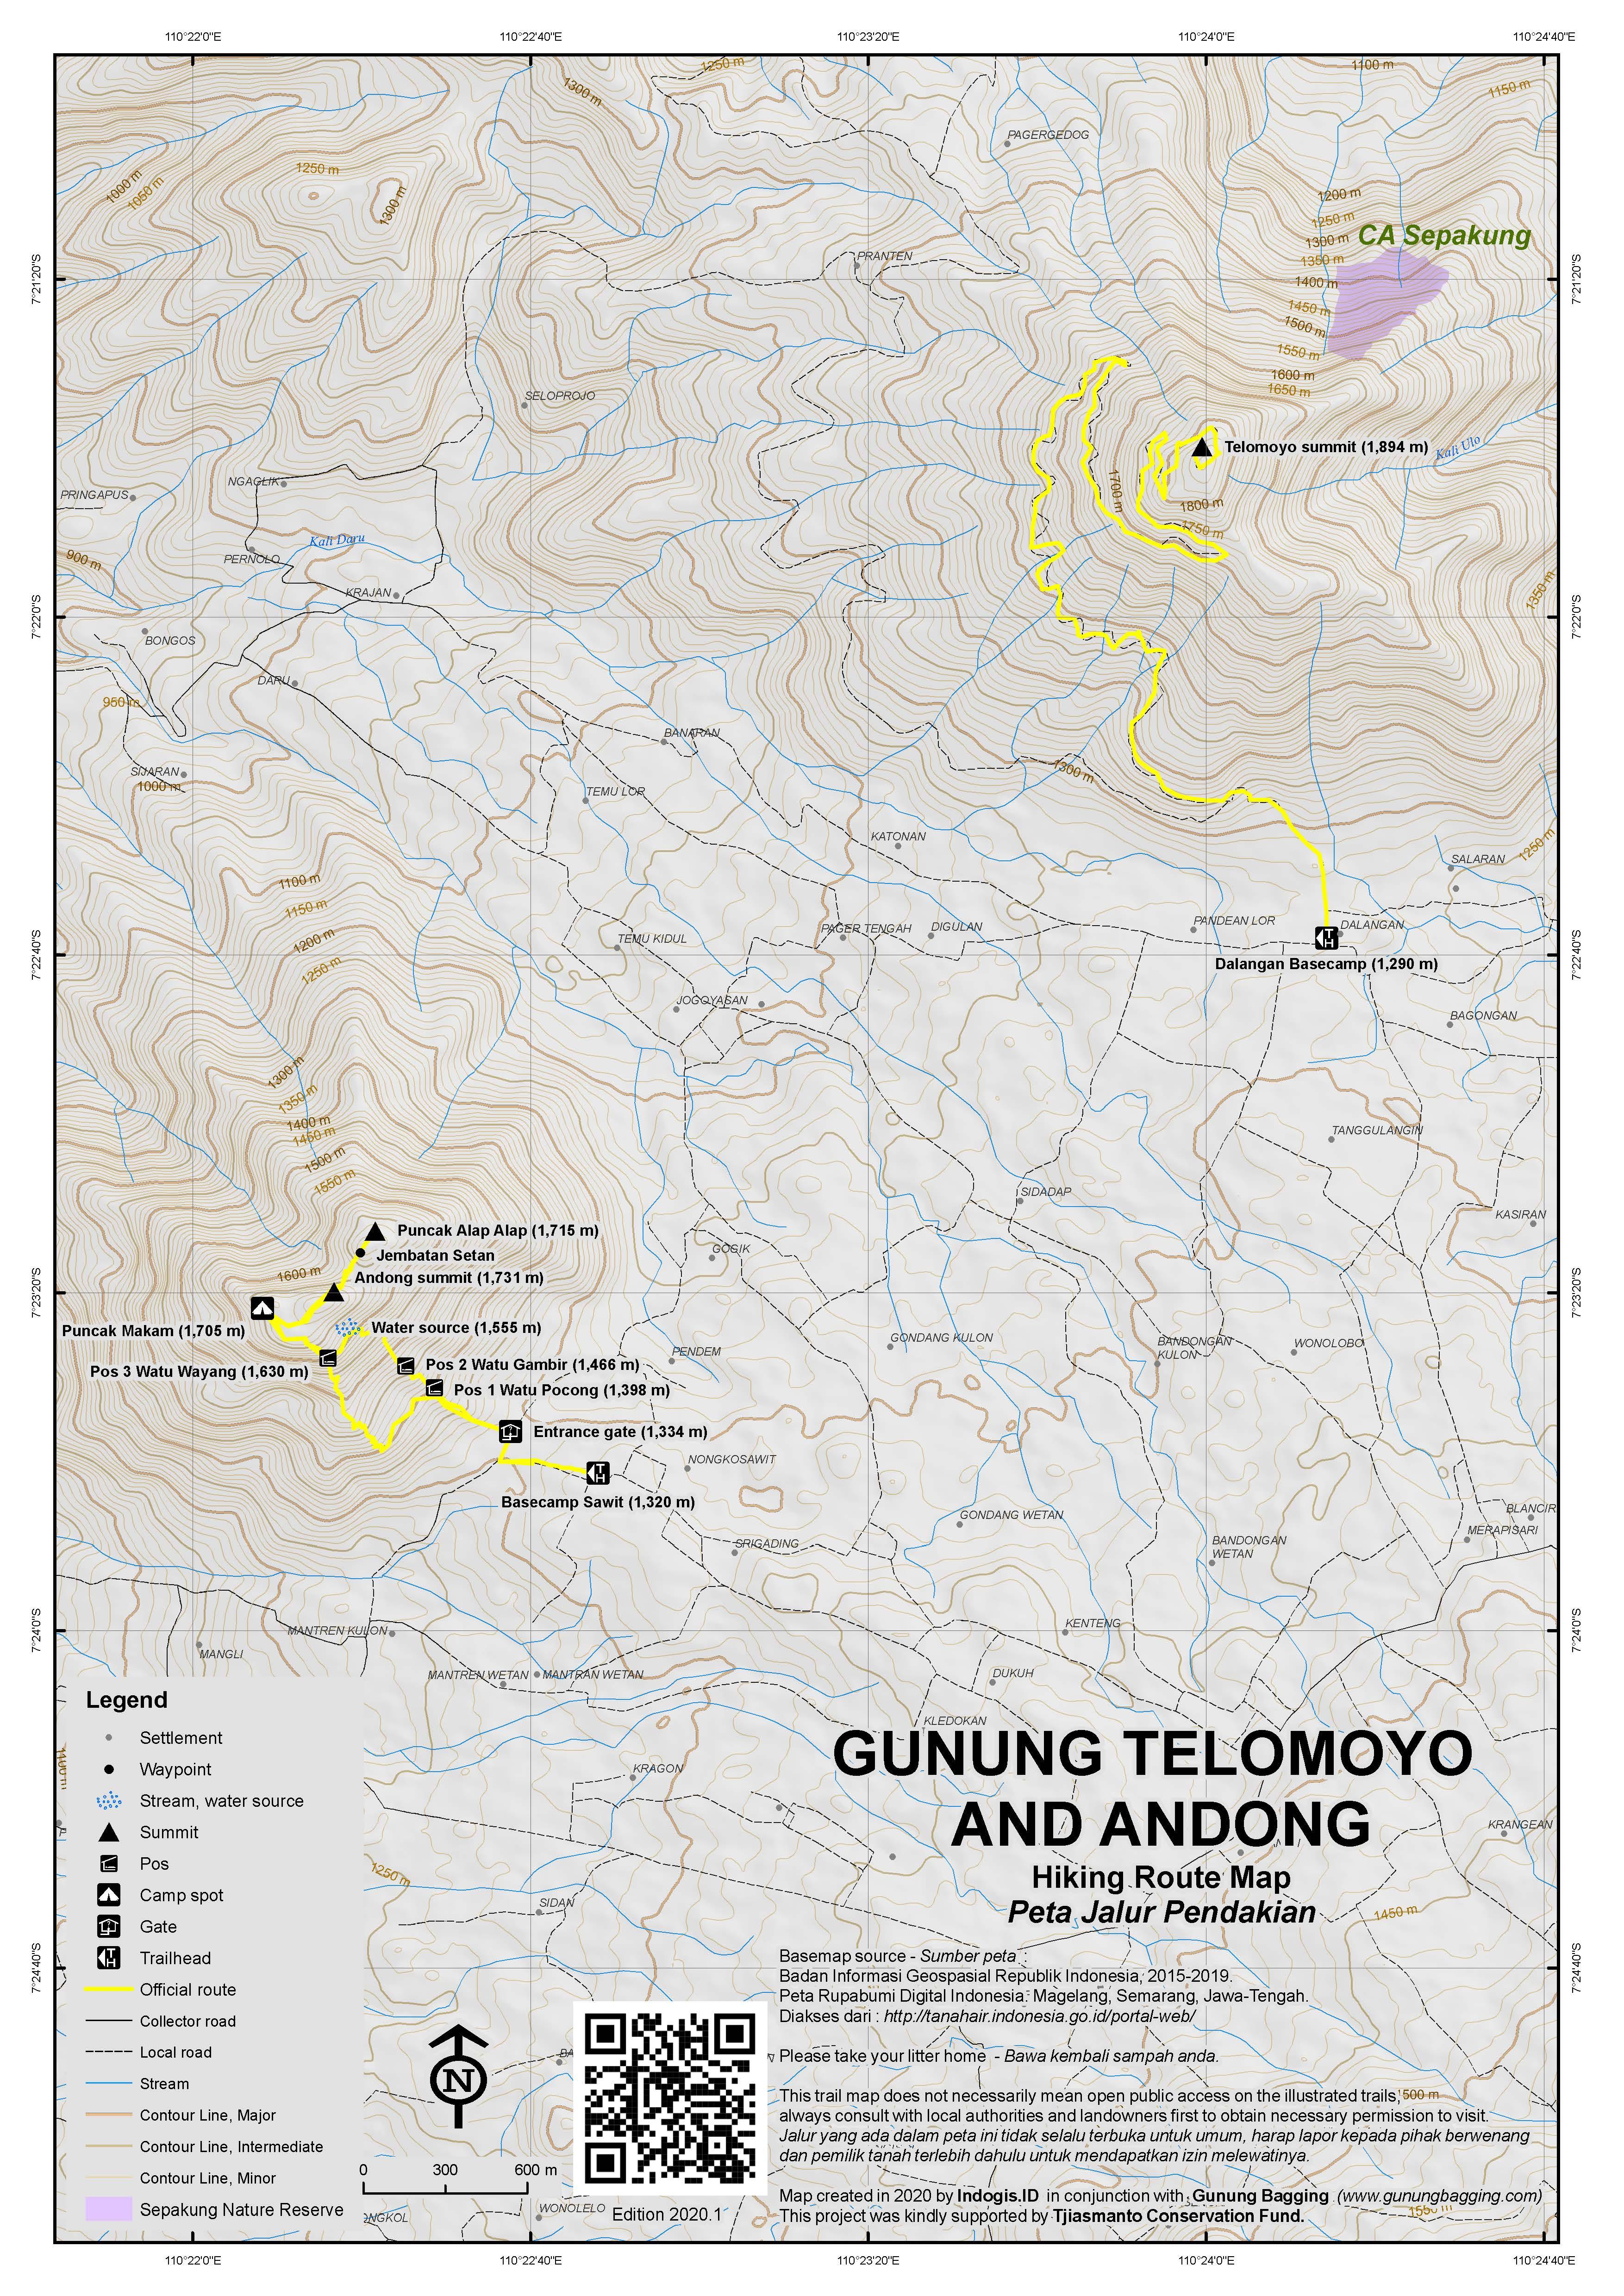 Peta Jalur Pendakian Gunung Telomoyo Andong